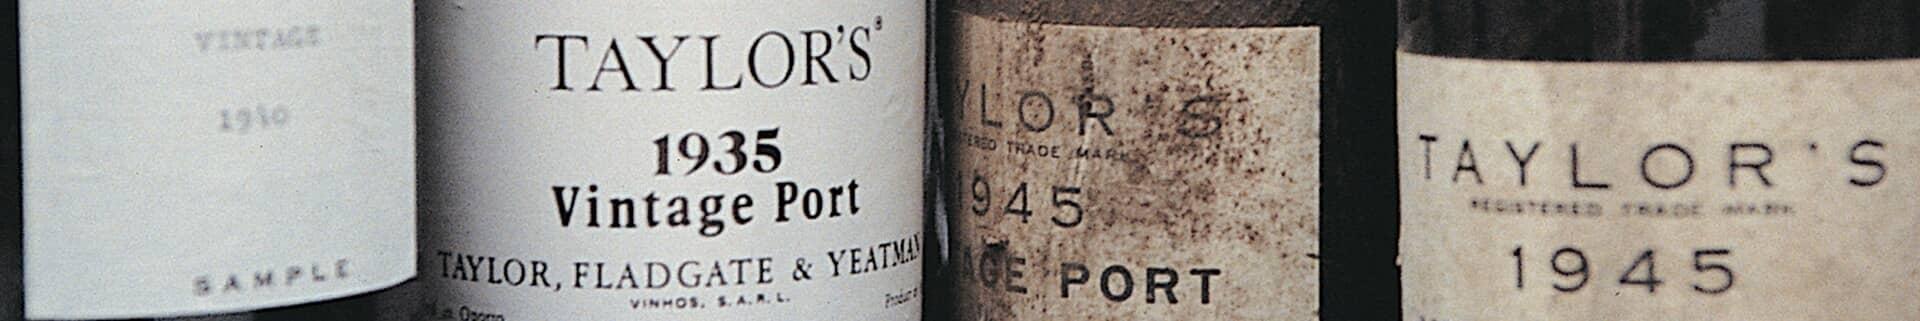 Vintage Port Years - Taylor\'s Port